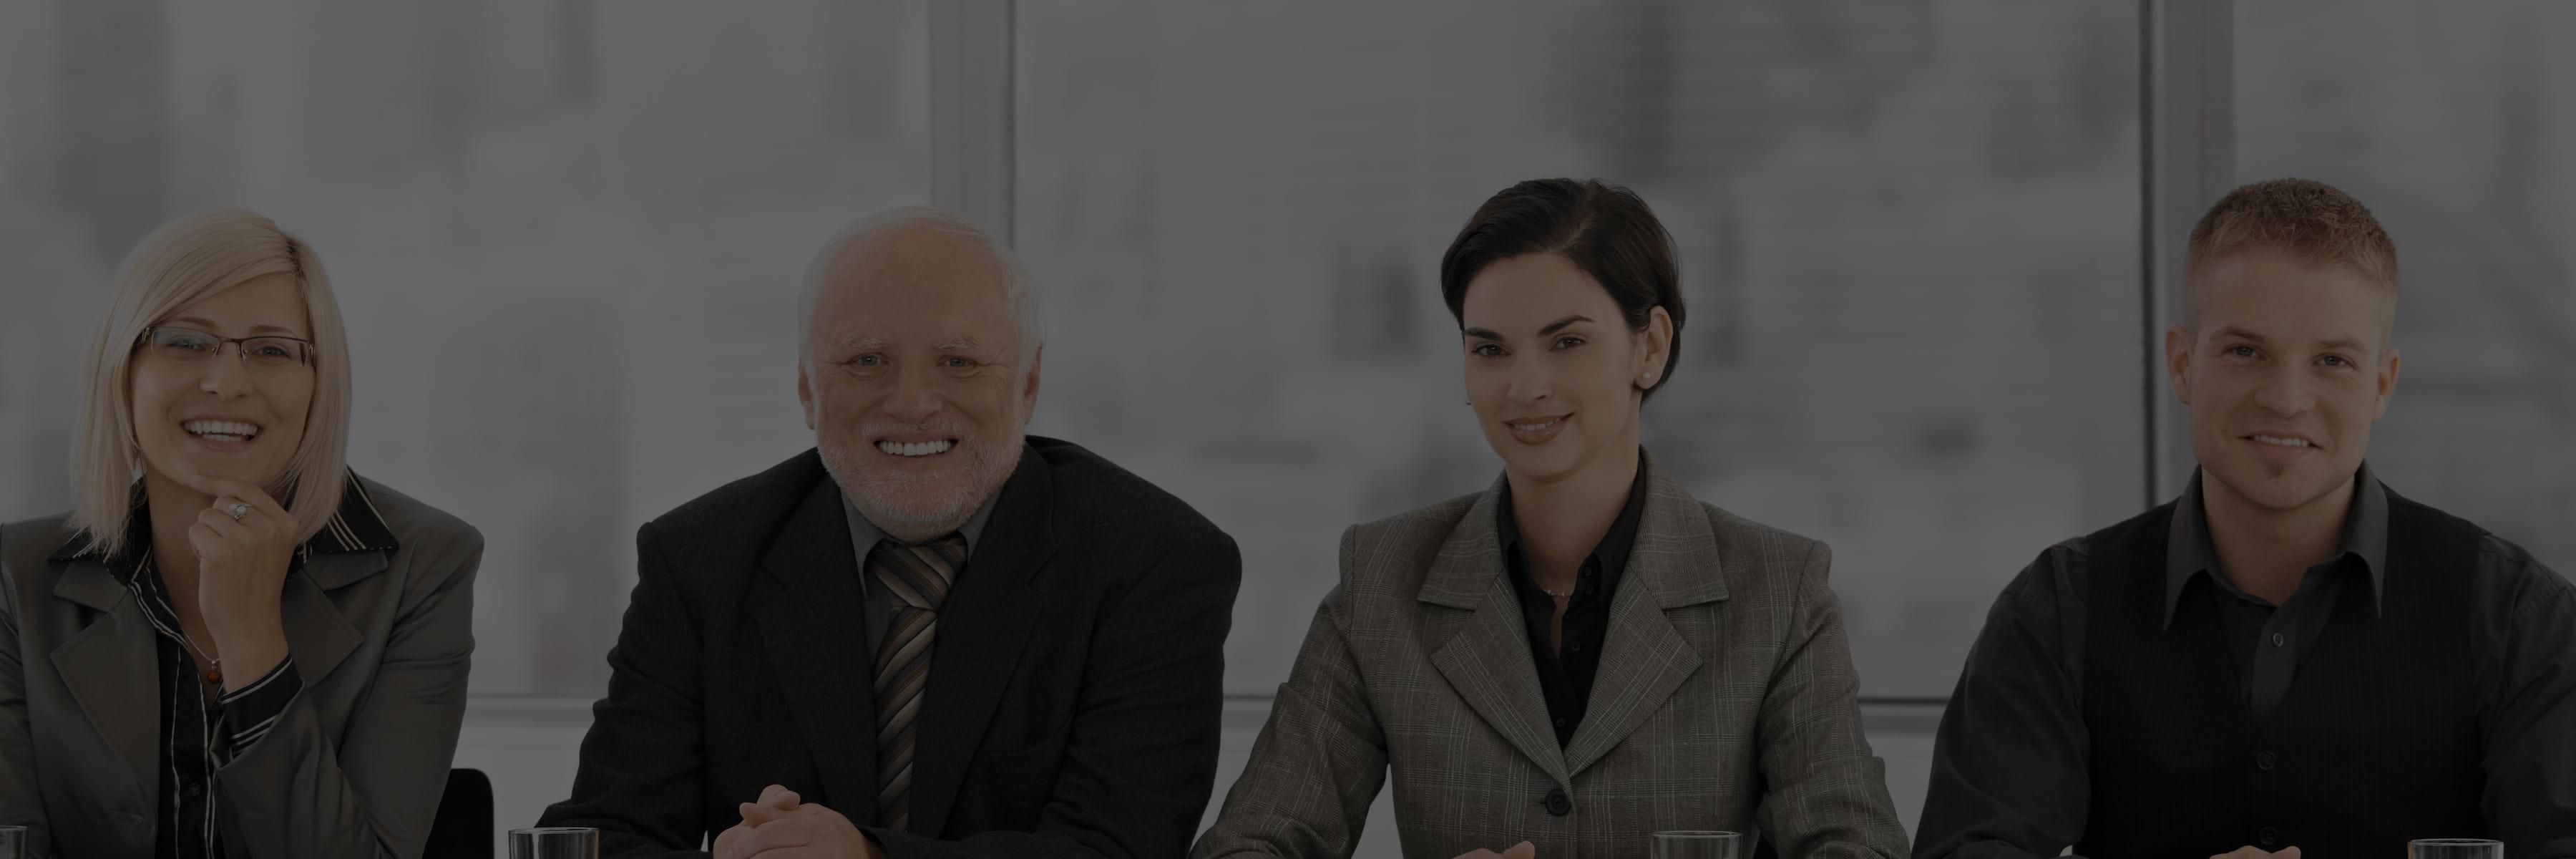 naem-webinar-2015-engaging-and-managing-a-multigenerational-workforce-1800x600-min